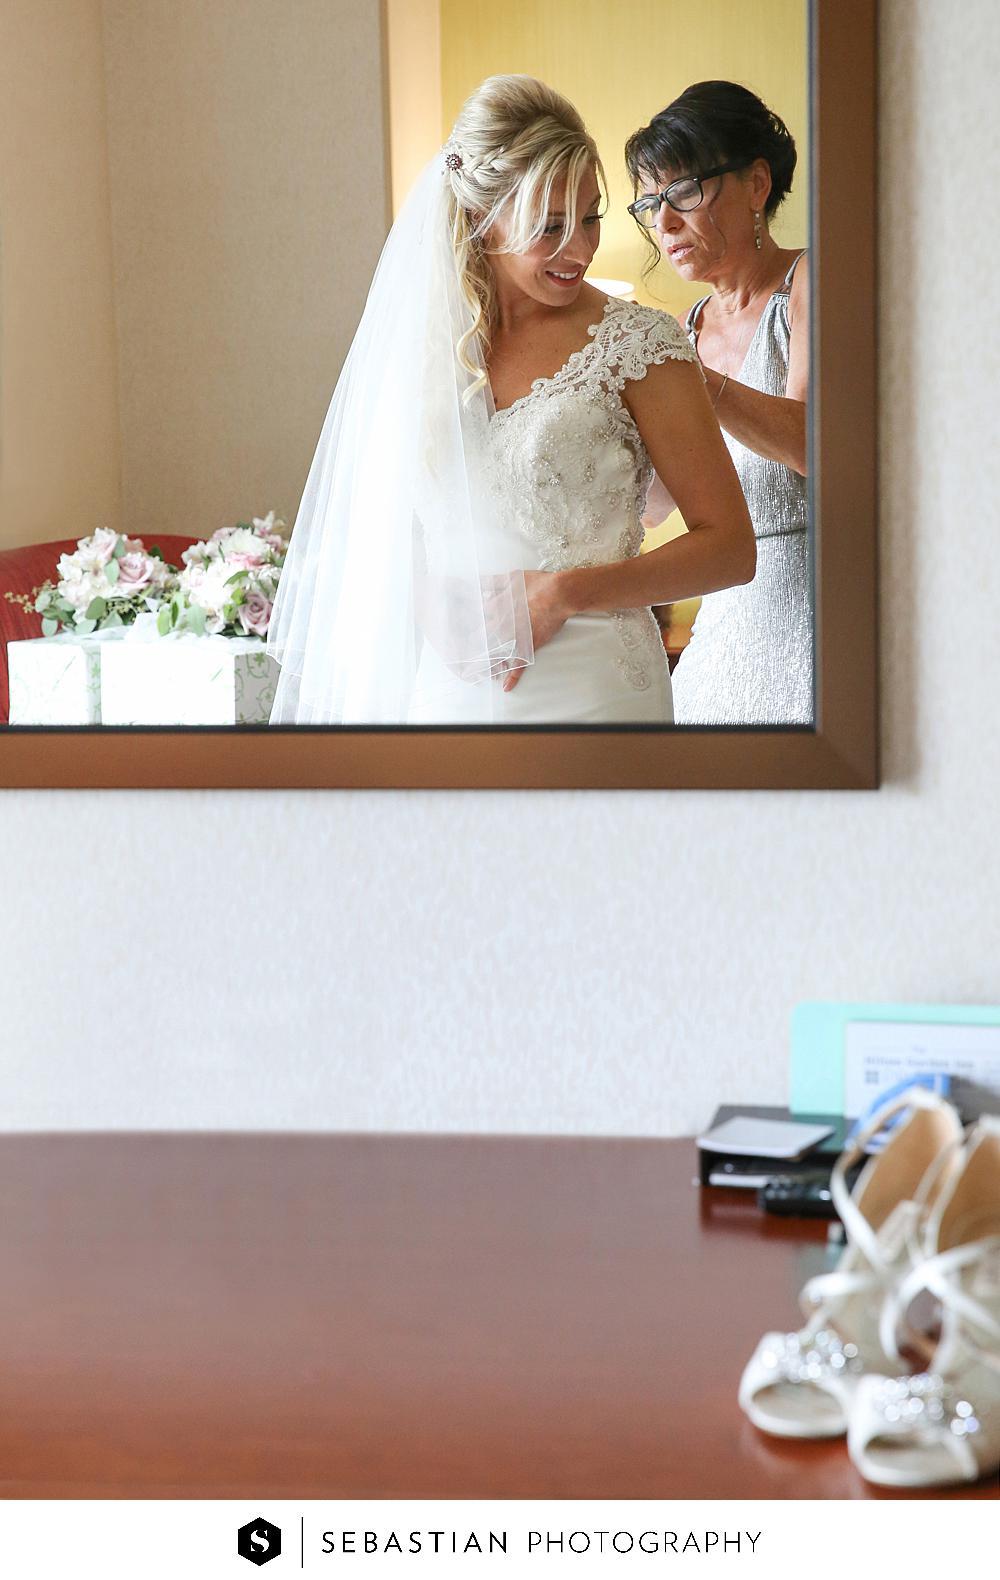 Sebastian Photography_Saint Clements Castle Wedding_CT Wedding Photographer__7013.jpg